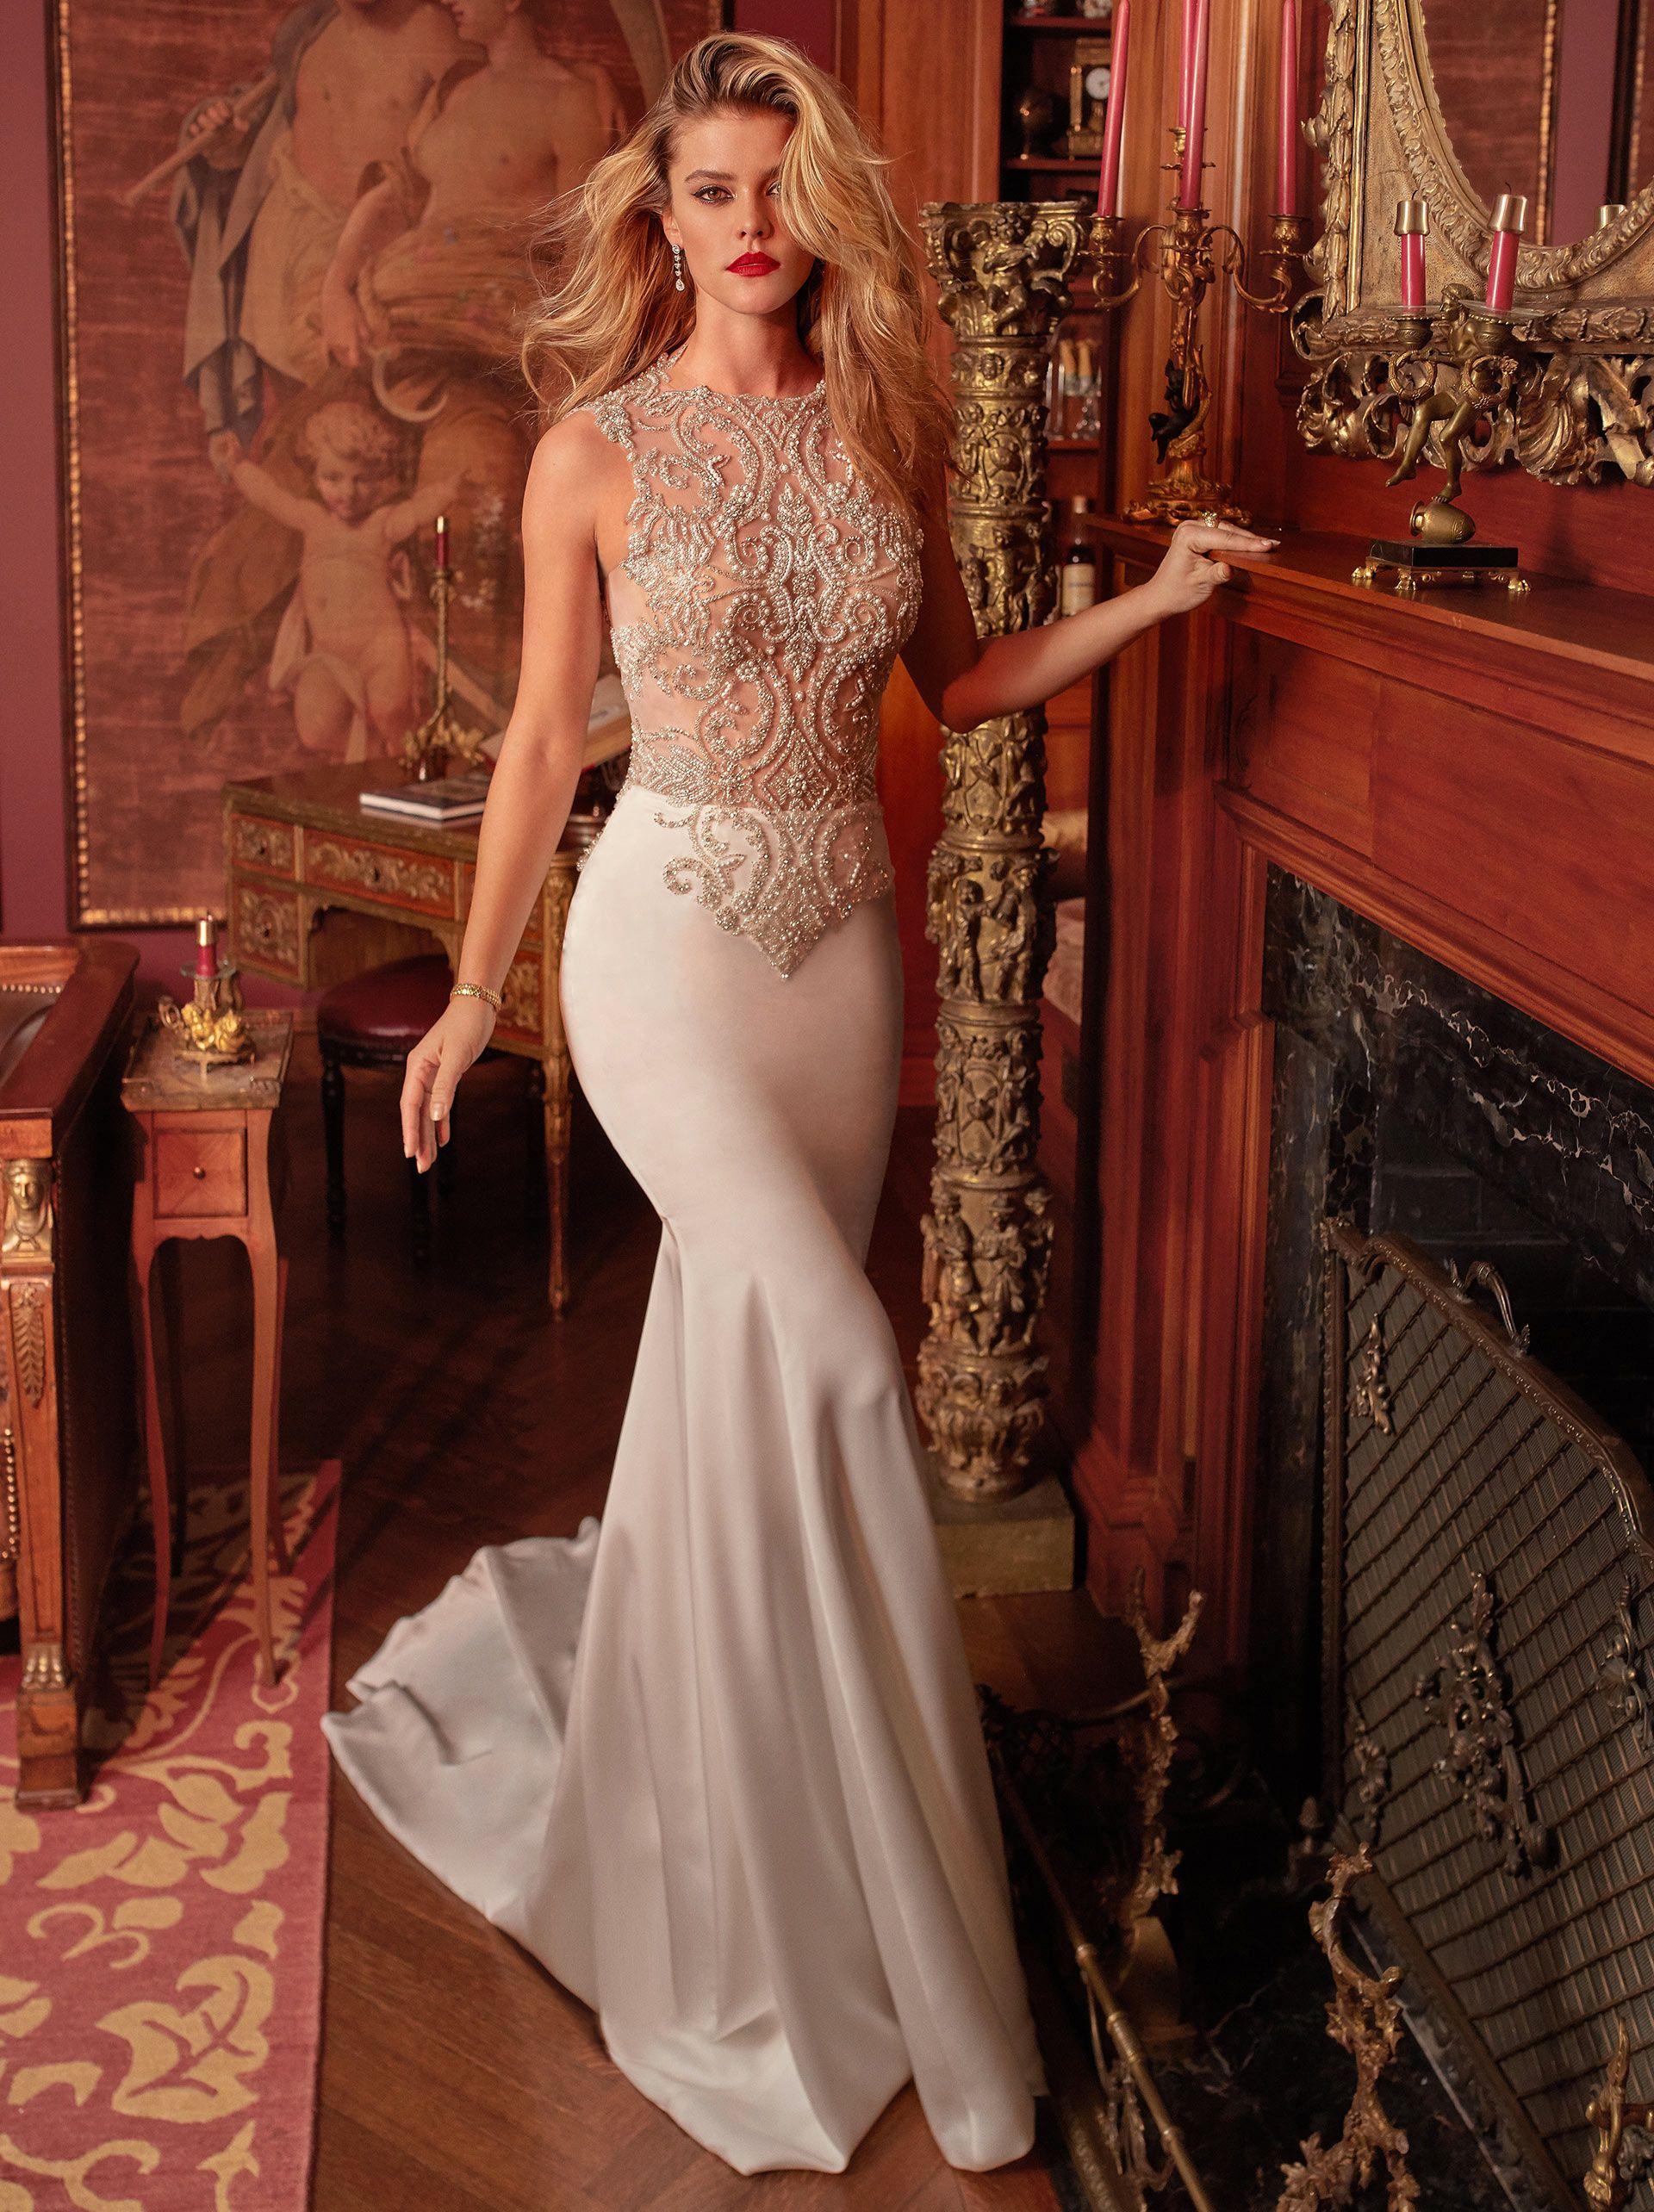 949a7f41f0 Luxury Crystal Wedding Dresses Sparkly Bead Mermaid Wedding Dress Bridal  Gowns Plus Size Bride Formal Gown Vestido De Novia Beaded Mermaid Wedding  Dress ...